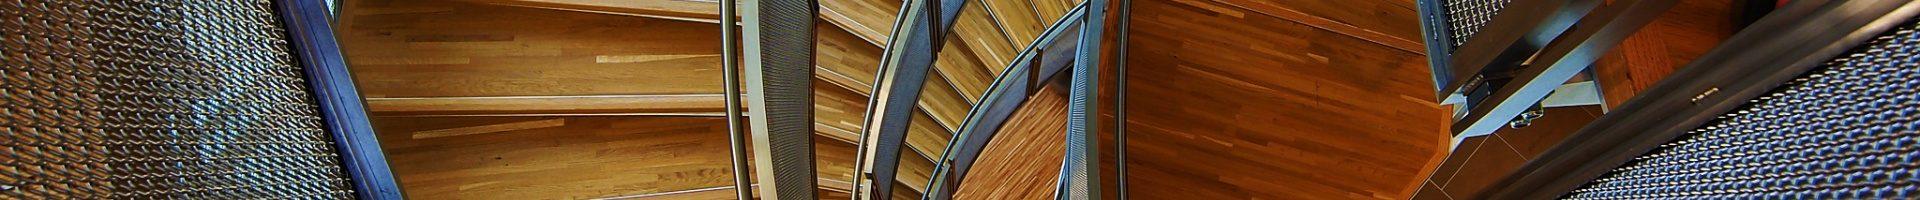 spiral_stairs-wallpaper-1920x1080